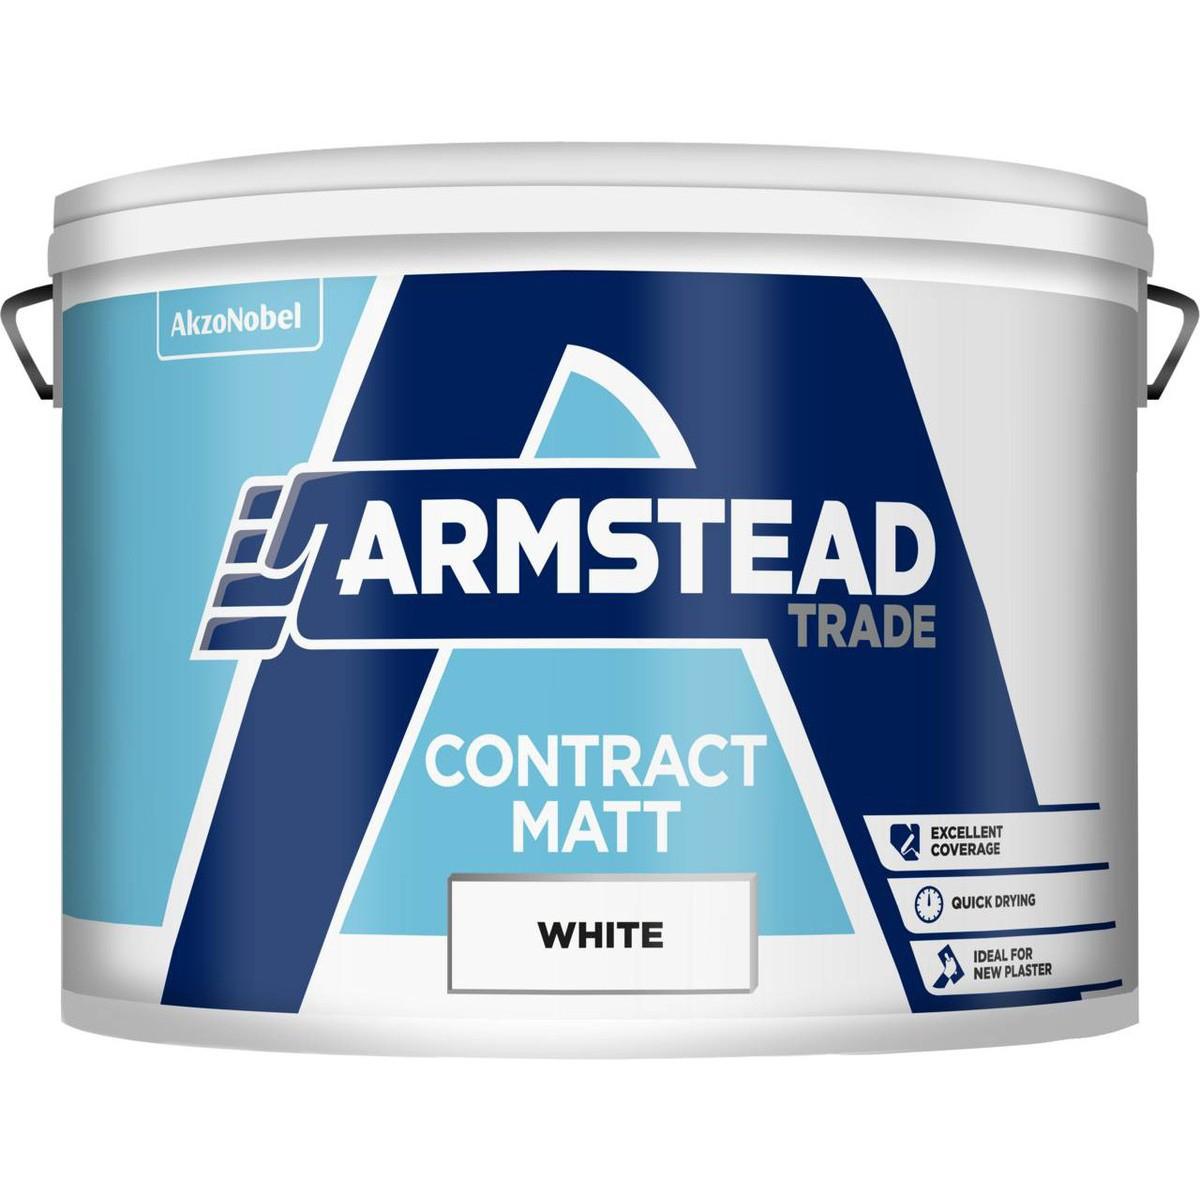 Armstead Contract Matt 10L £15 @ Travis Perkins